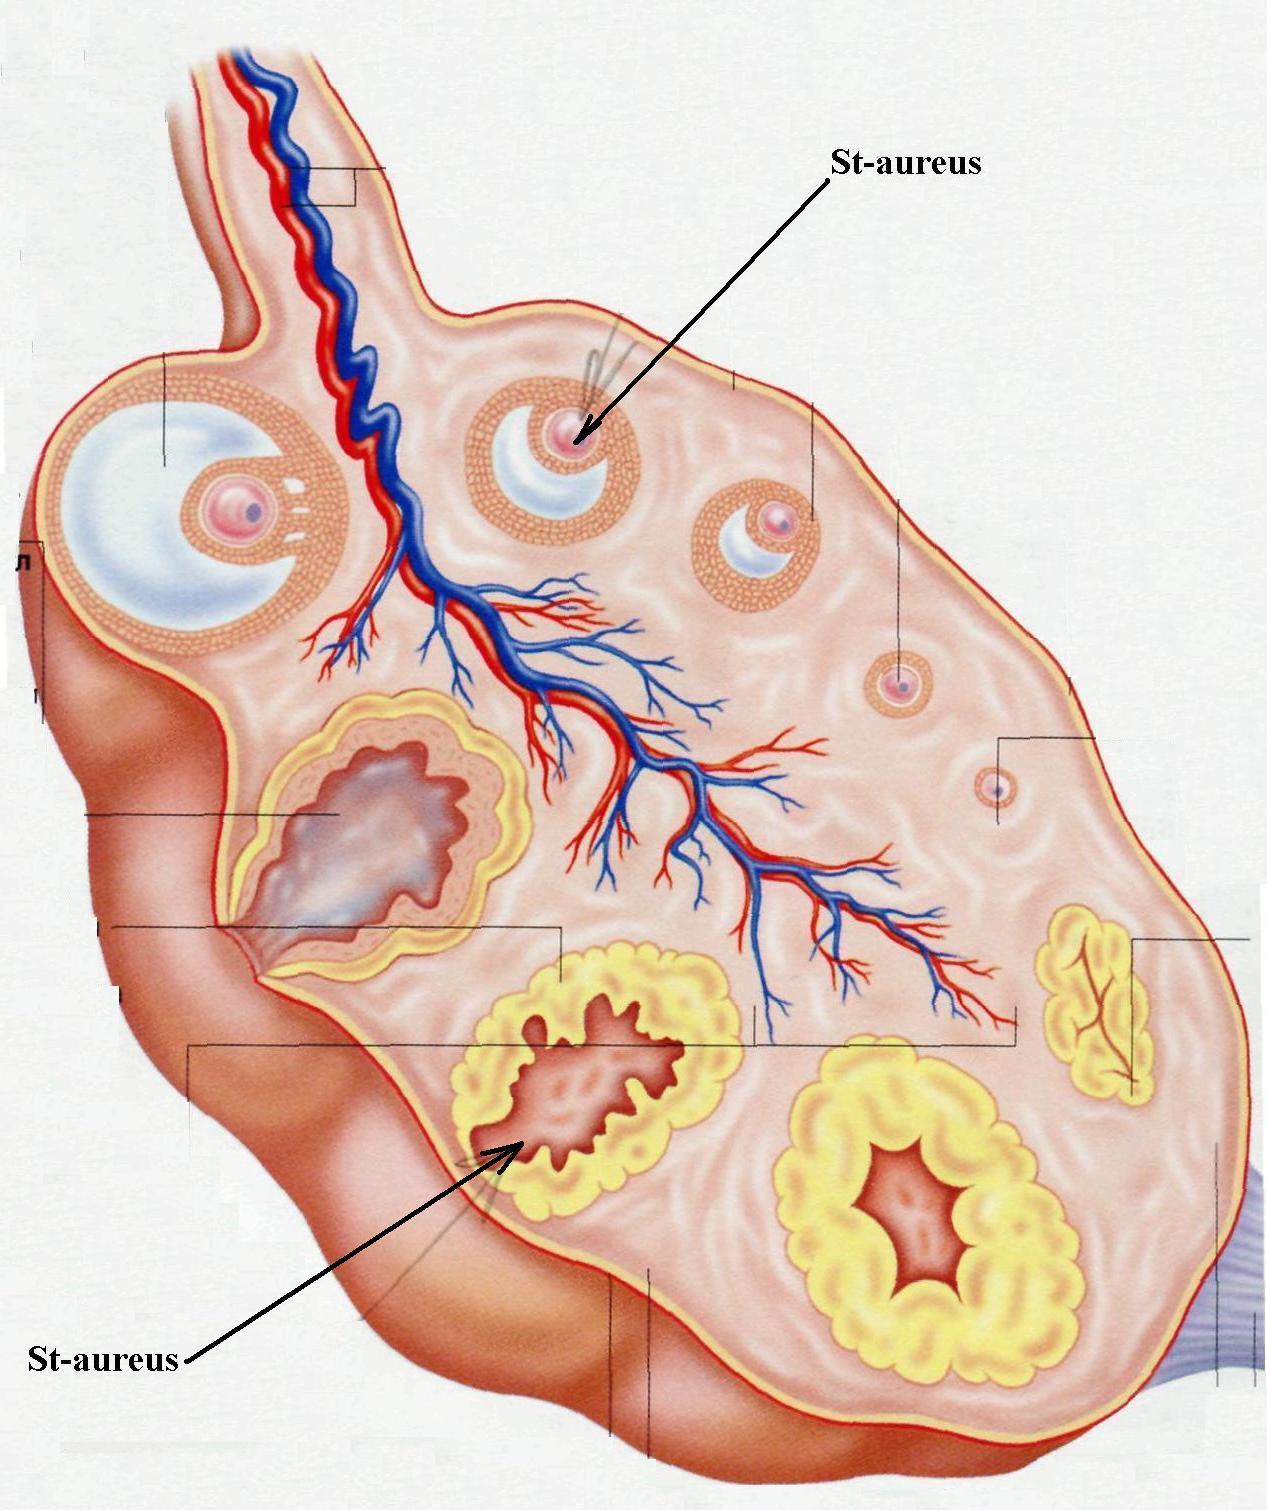 При беременности staphylococcus aureus